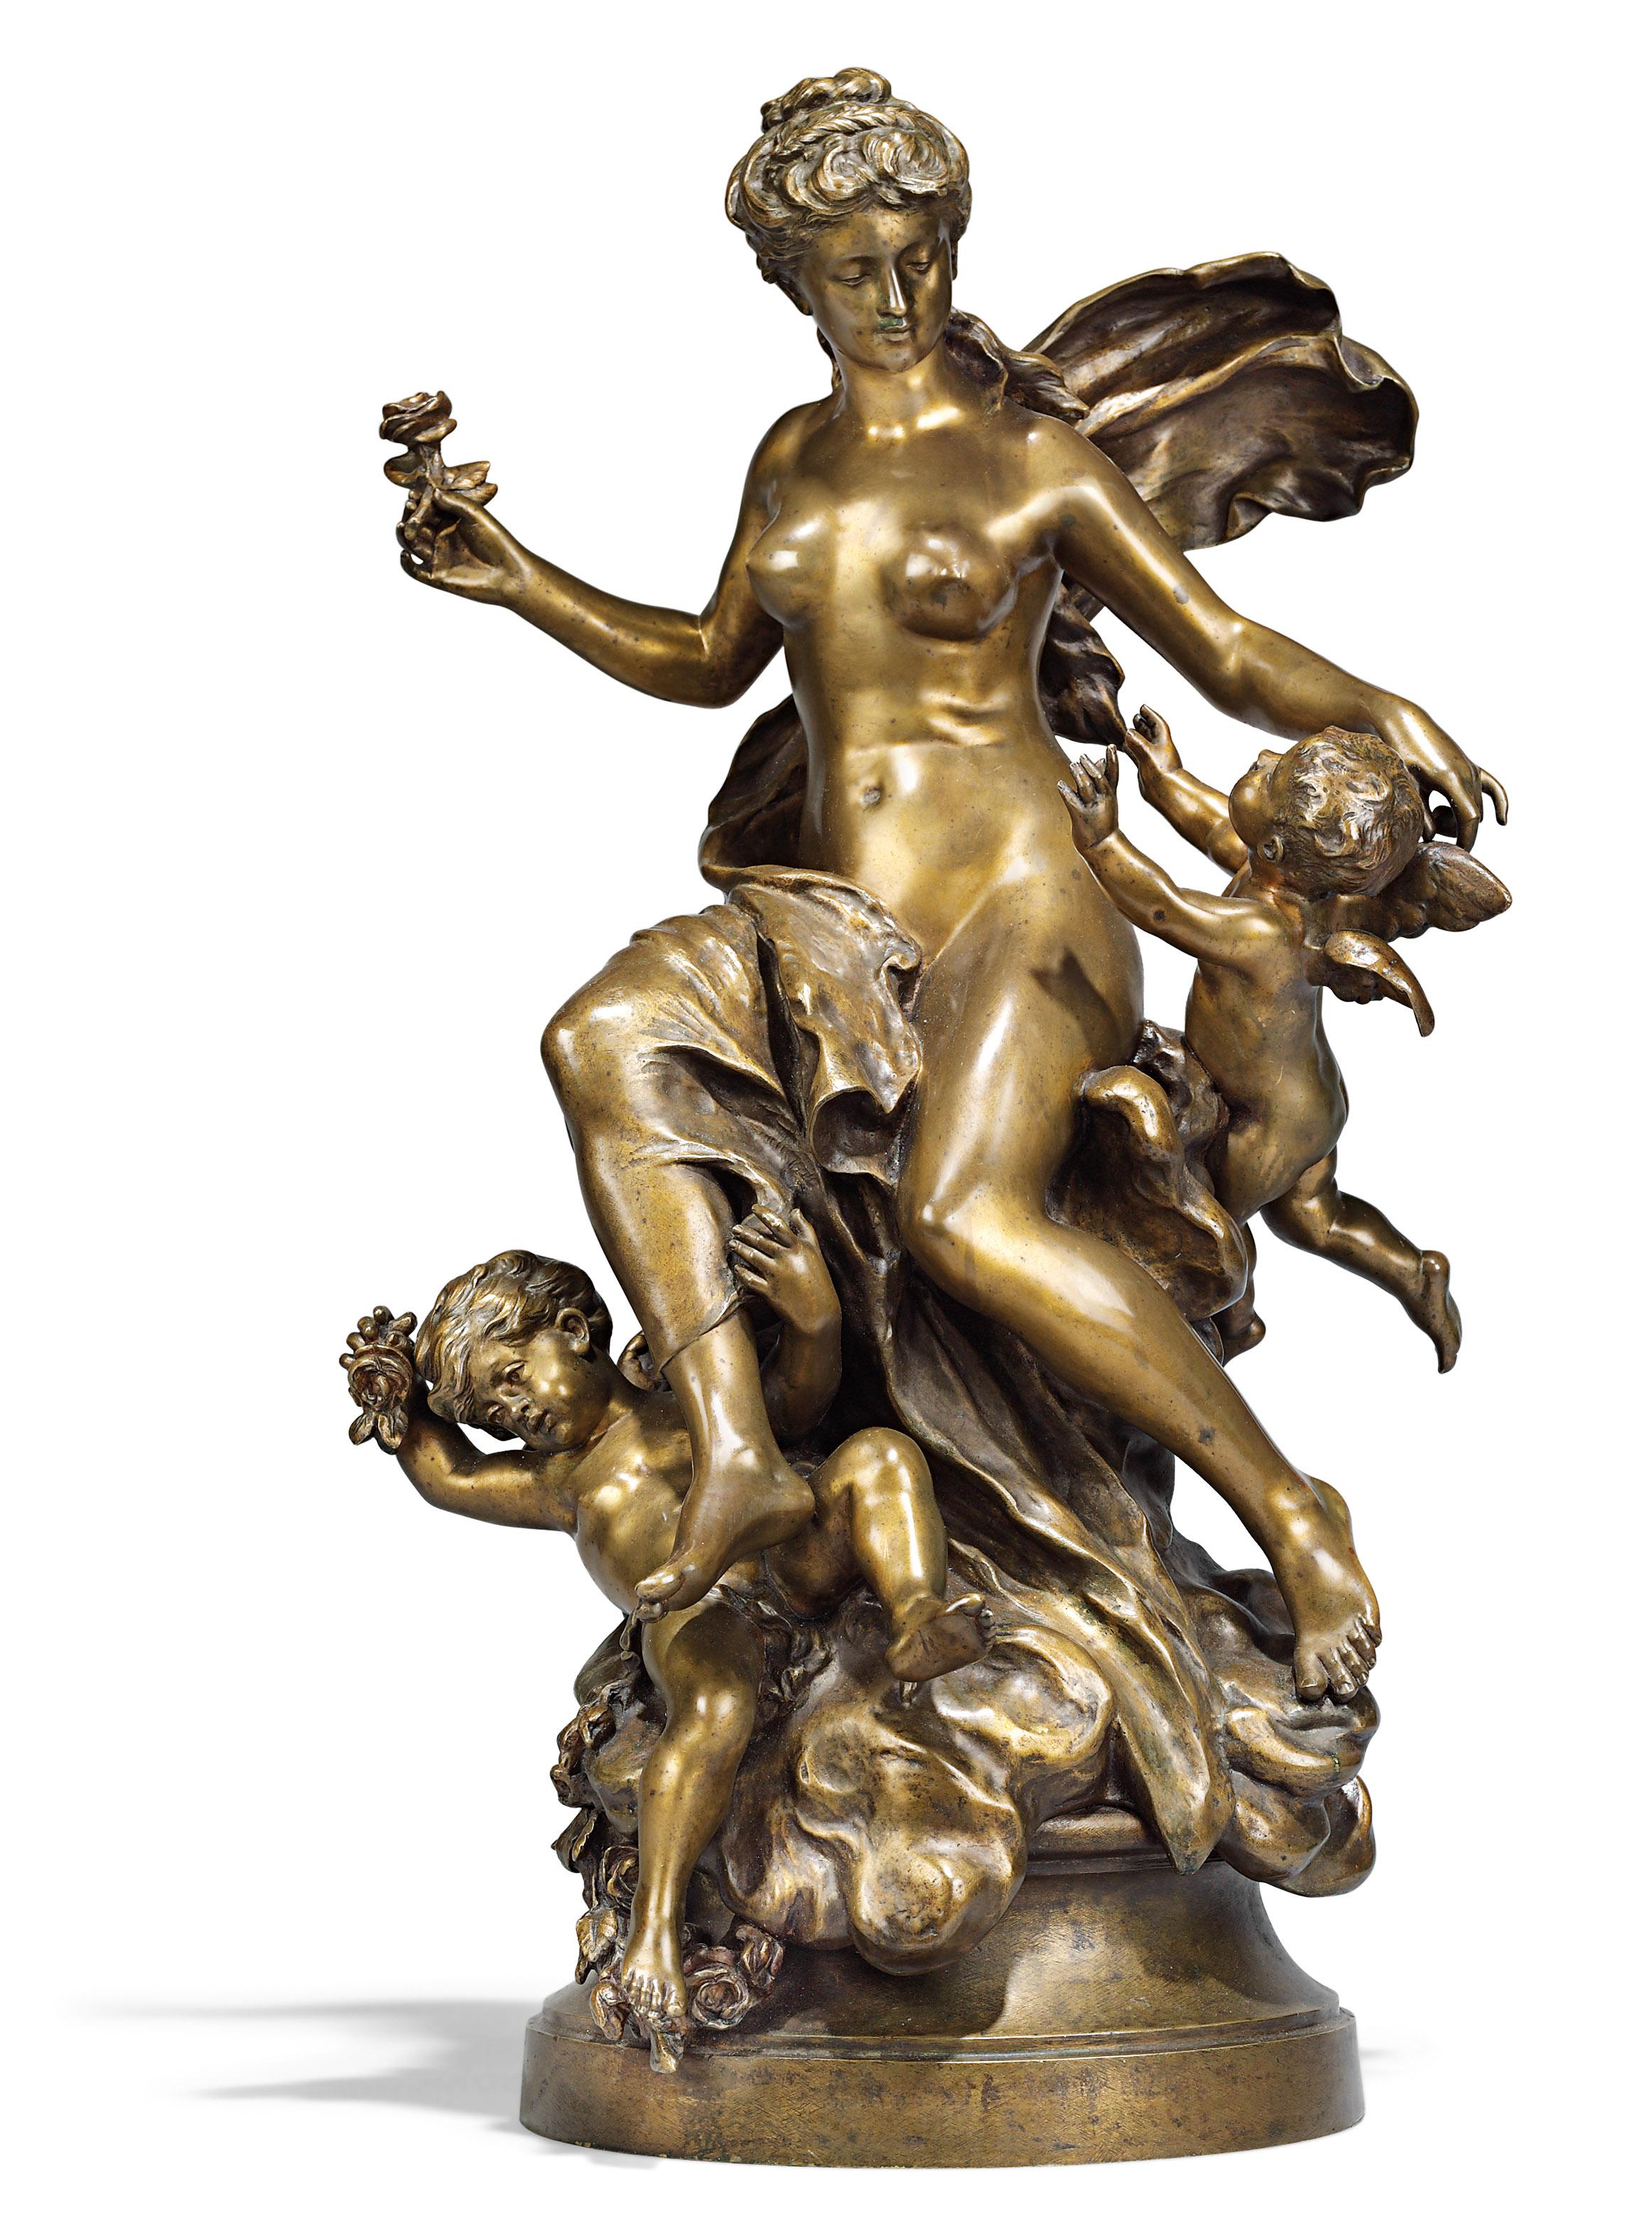 A FRENCH PATINATED-BRONZE FIGURAL GROUP OF VENUS AND PUTTI, ENTITLED 'JEUNE FEMME ET DEUX ENFANTS AILES'